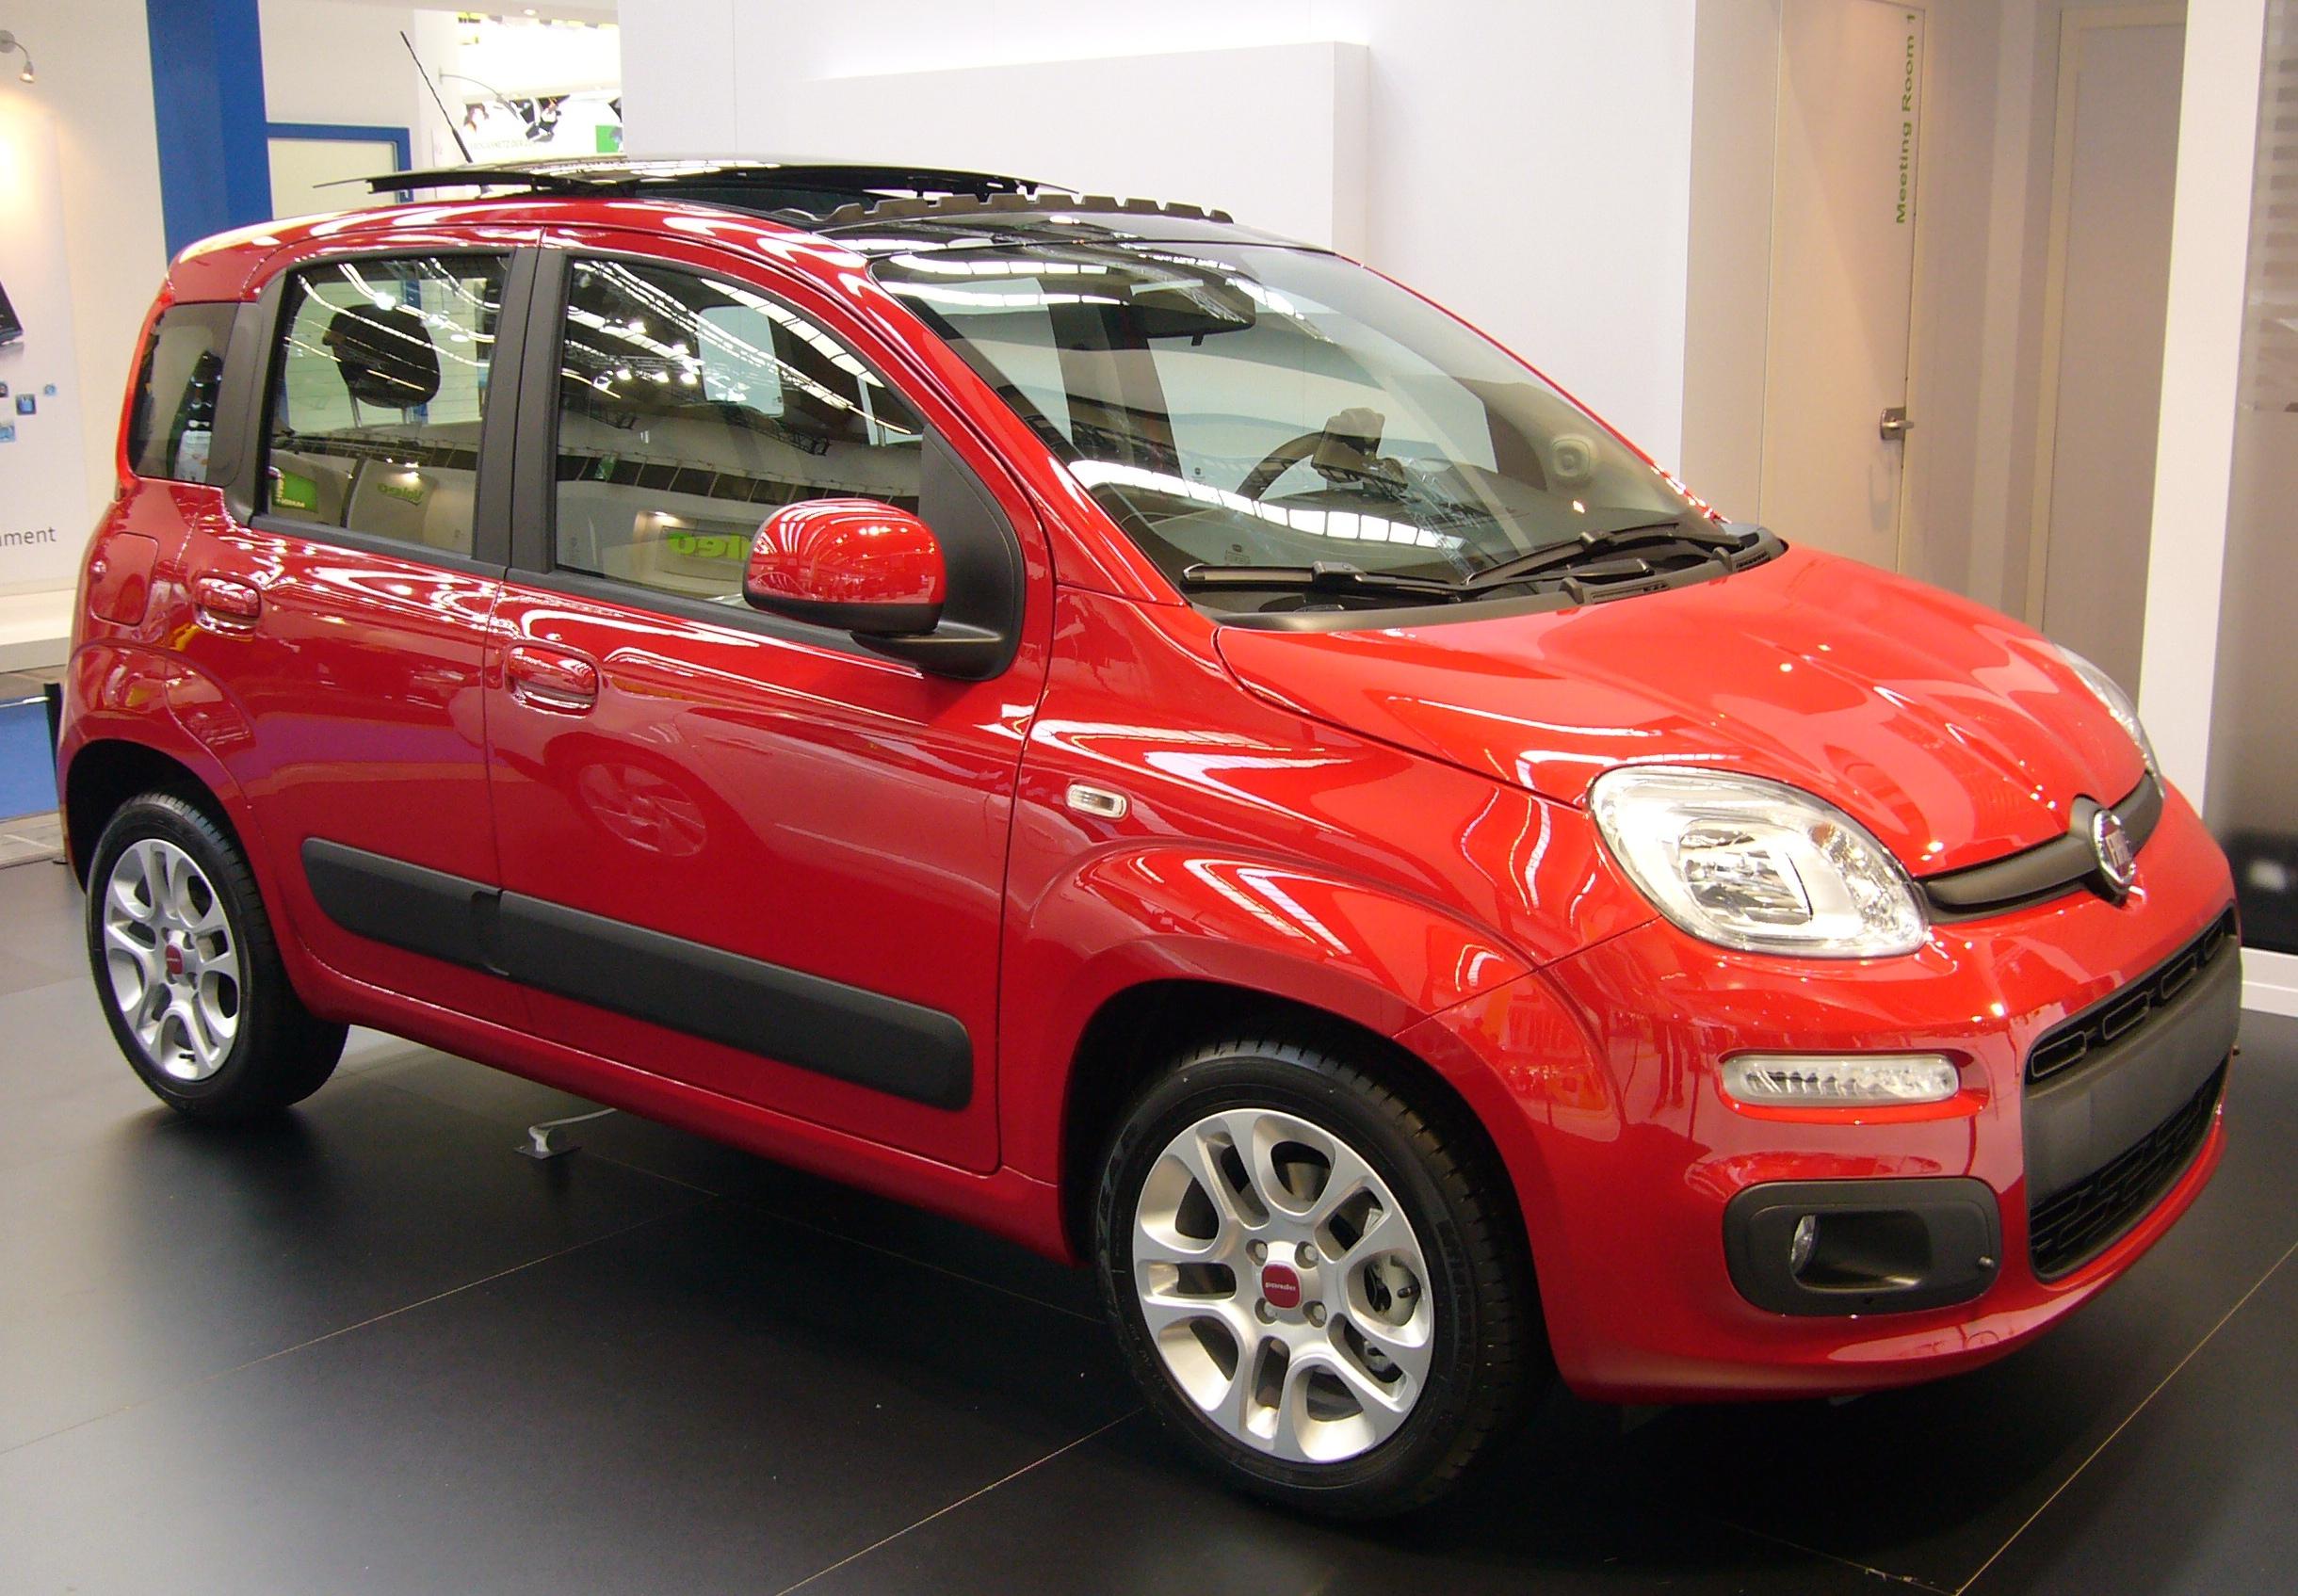 Fiat_Panda_%282011%29_front_side_quarter.jpg